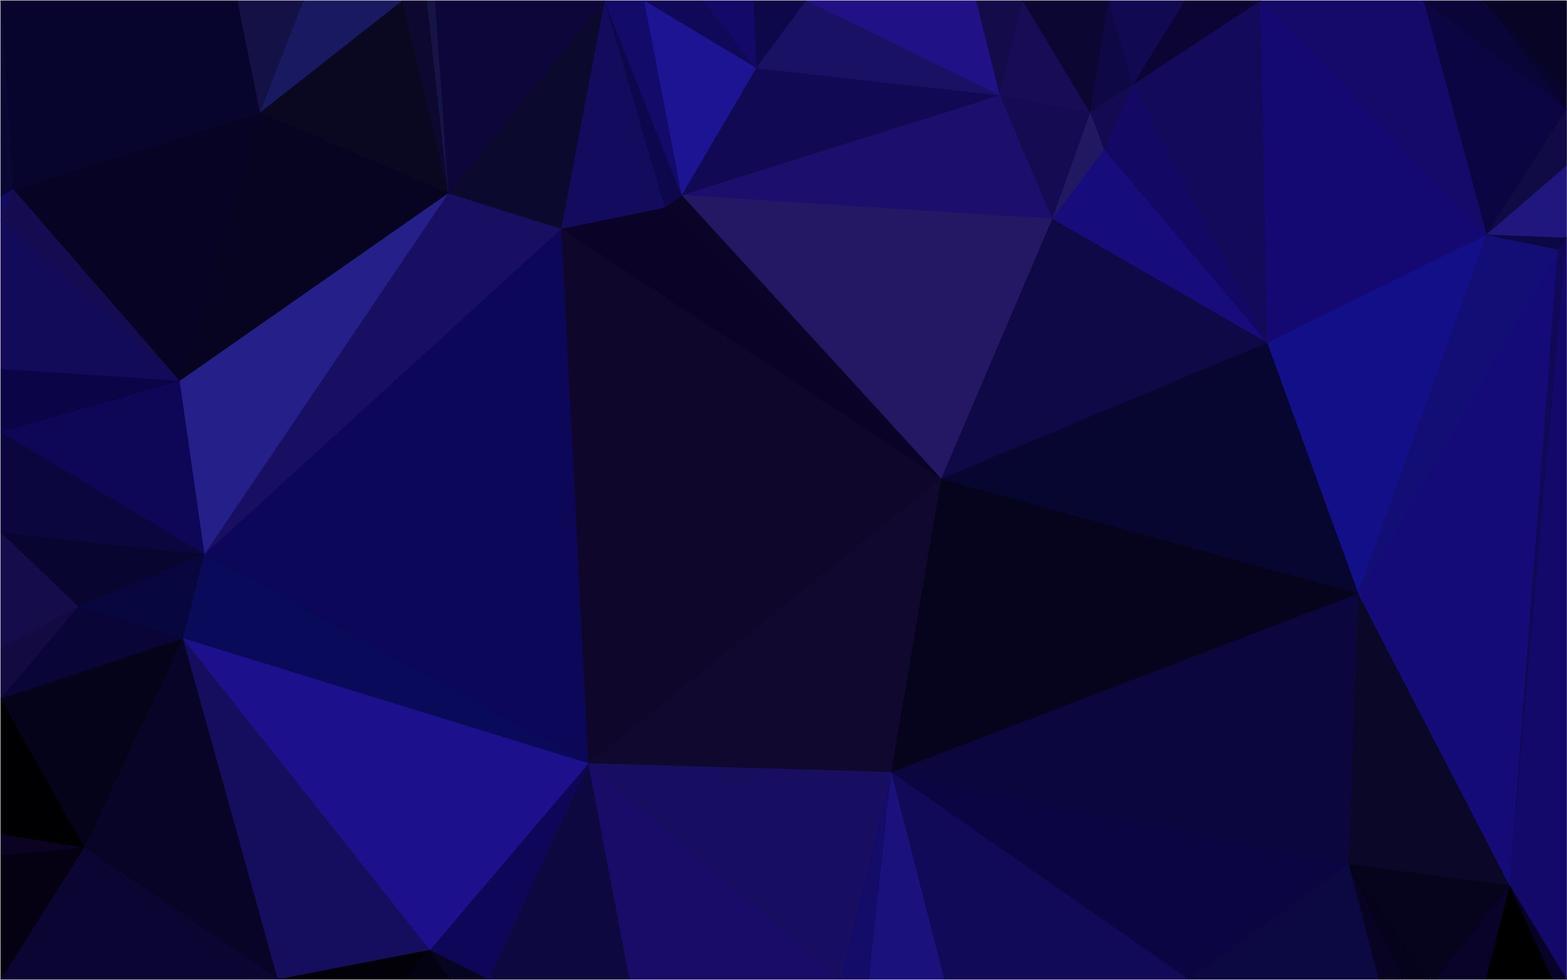 mörkblå poly bakgrund vektor